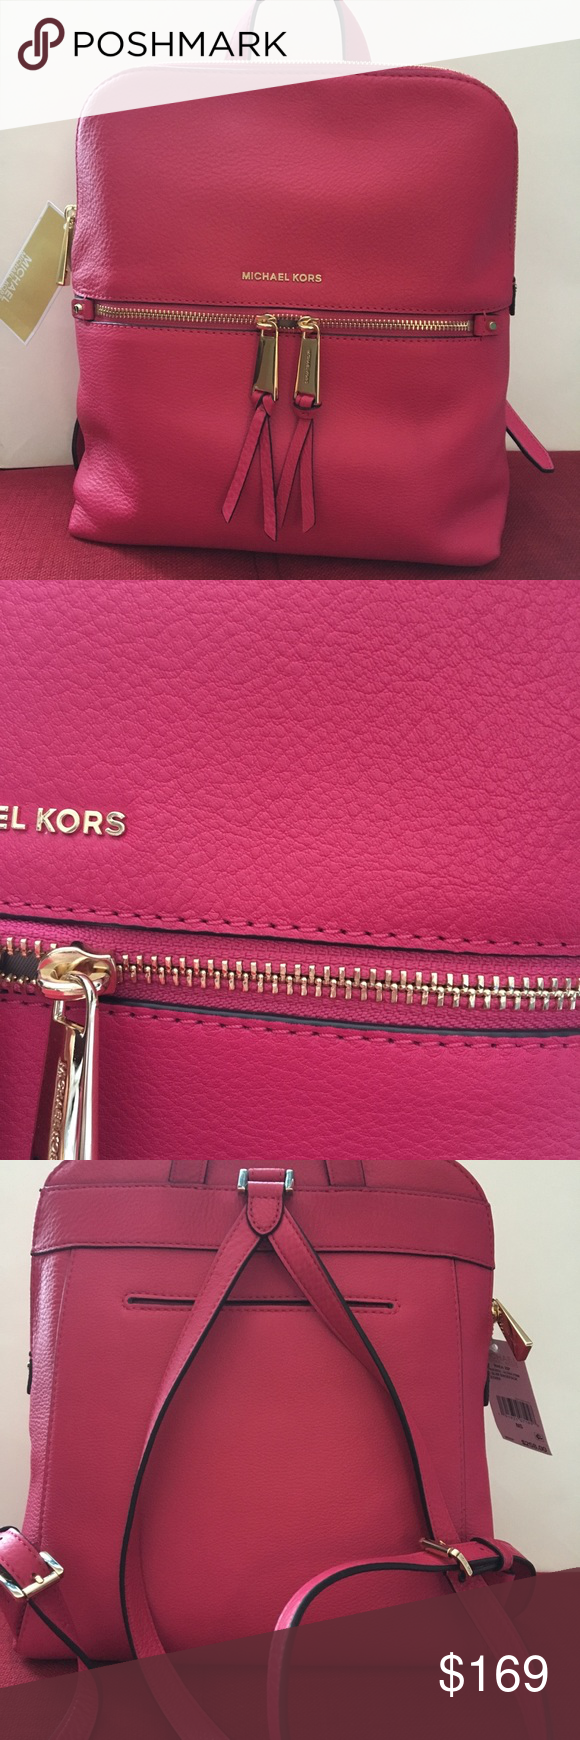 619add96c8d1f7 Michael Kors Michael Kors Rhea Zip Ultra Pink MD Slim BackPack Leather  30h6gezb2l Michael Kors Bags Backpacks